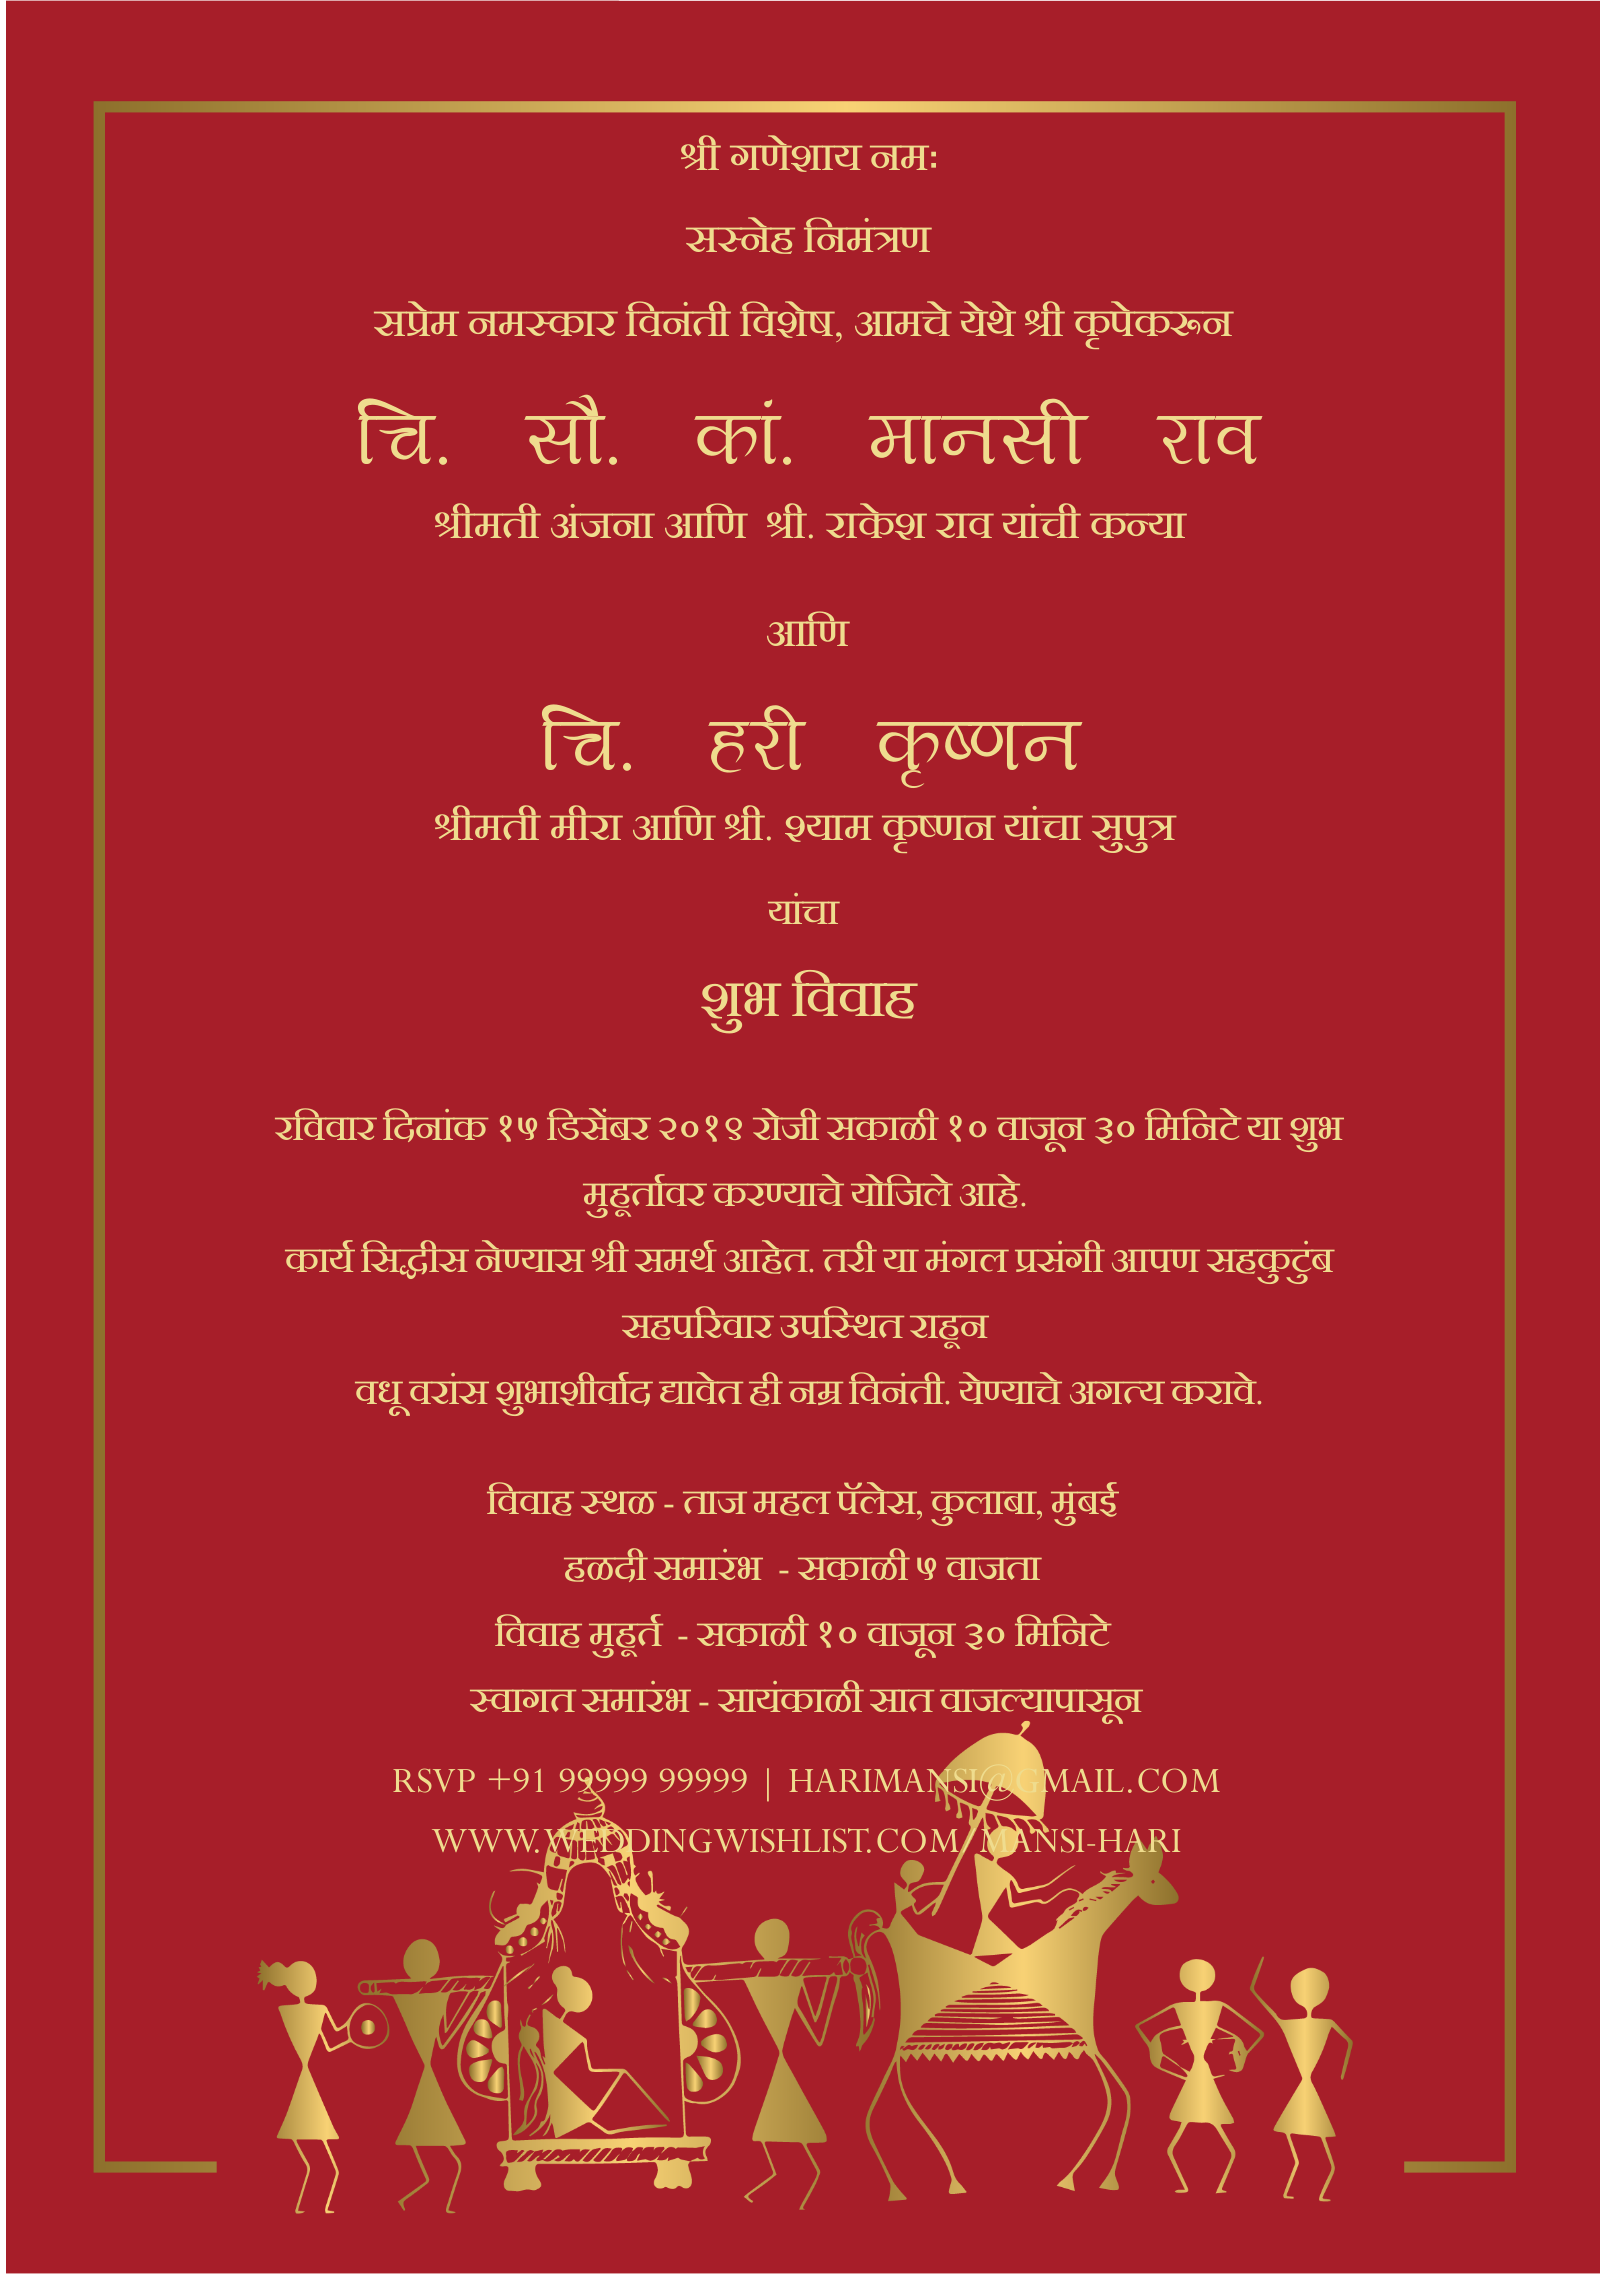 Msg wedding marathi invitation in Wedding Invitation